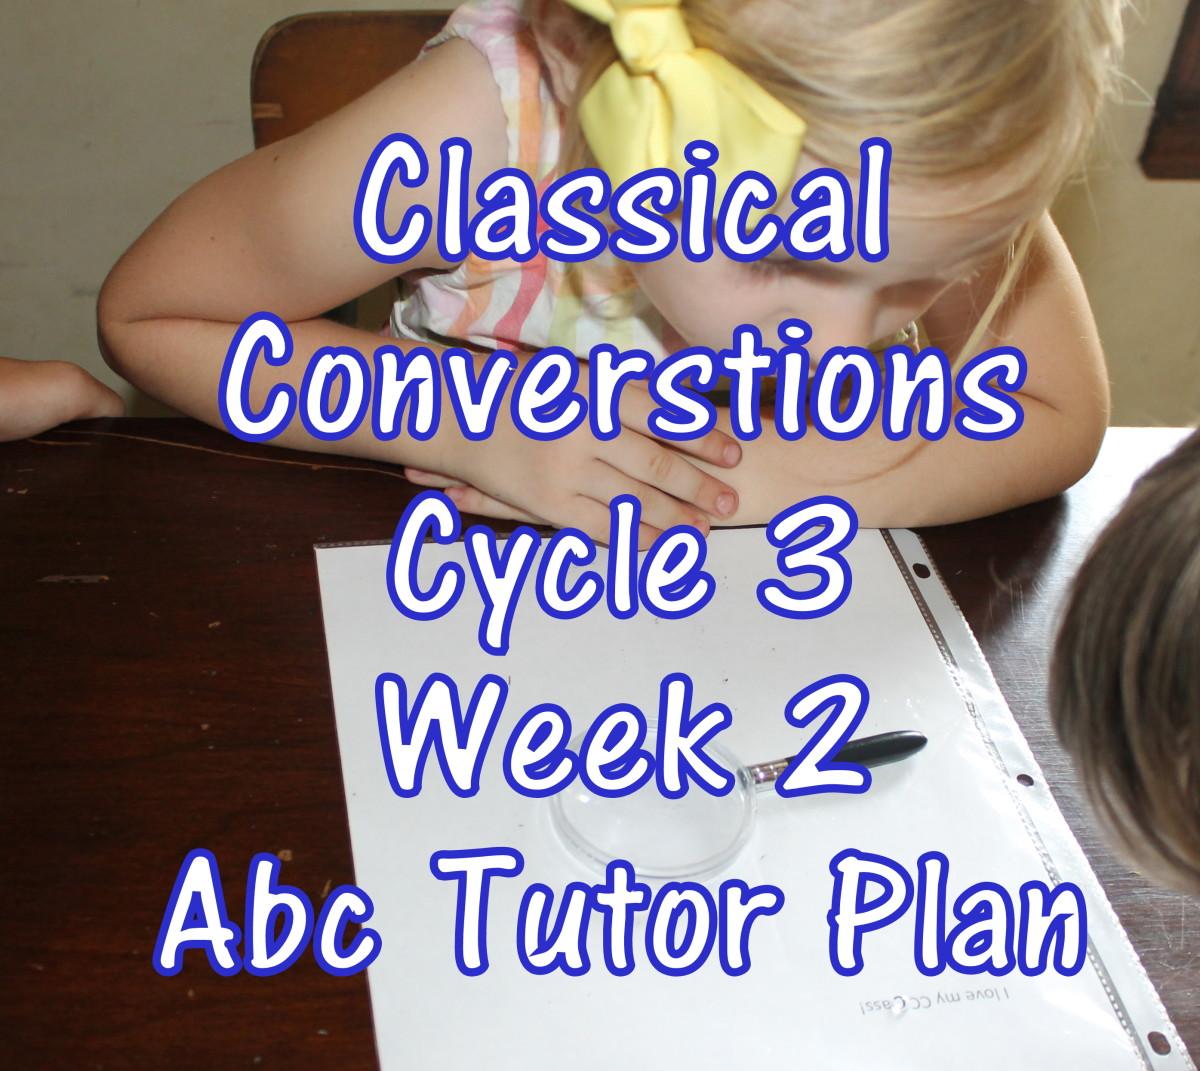 Classical Conversations CC Cycle 3 Week 2 Lesson for Abecedarians - CC C3W2